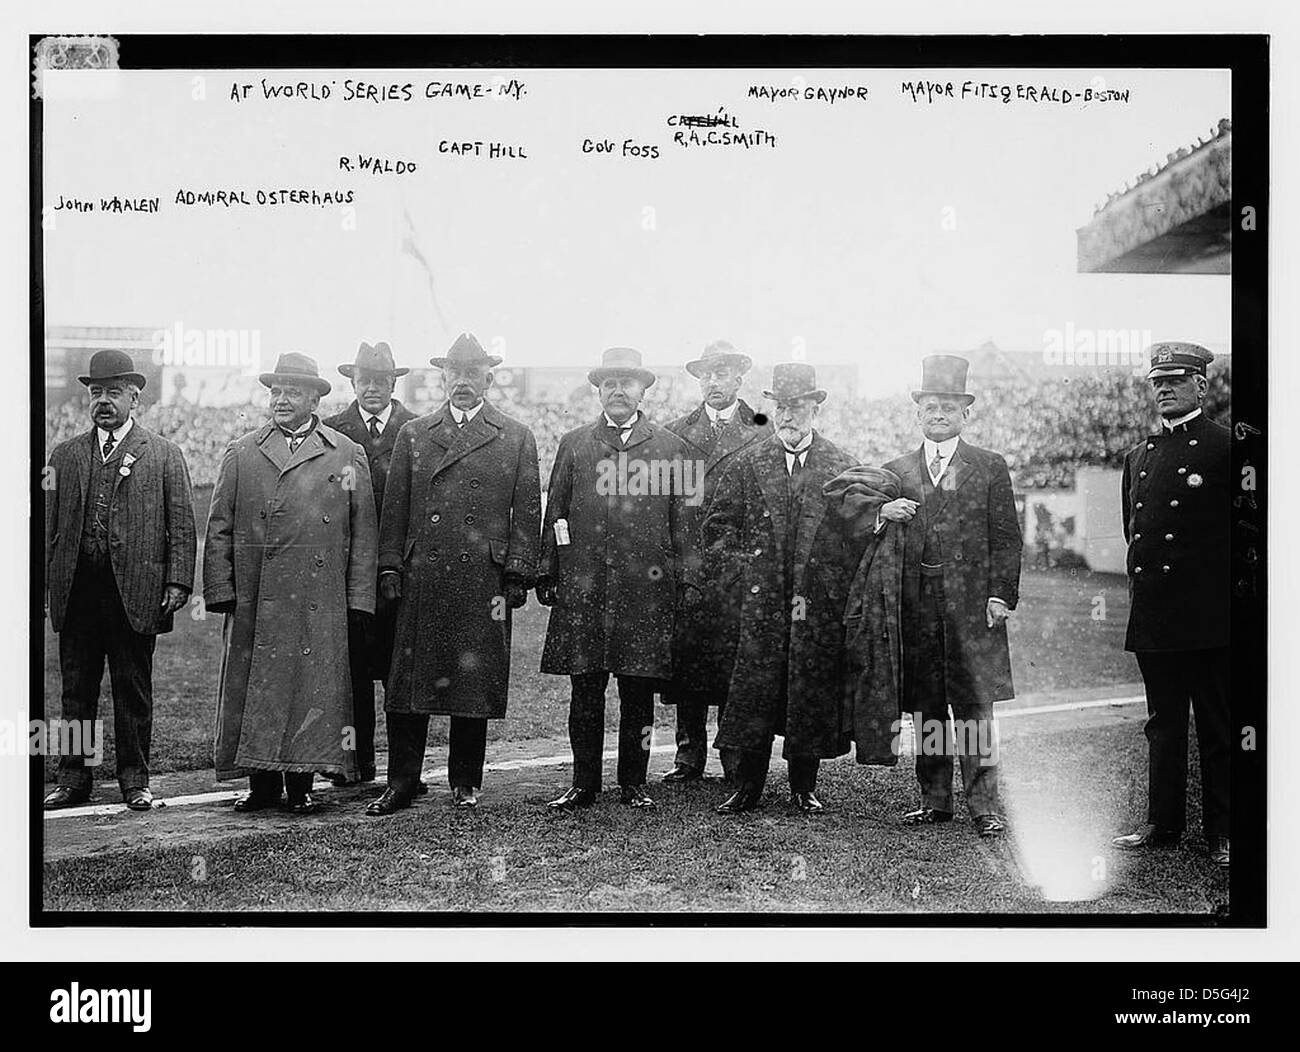 At World Series game, NY: John Whalen, Admiral Osterhaus, R. Waldo, Capt. Hill, Gov. Foss, R.A.C. Smith, Mayor Gaynor, - Stock Image